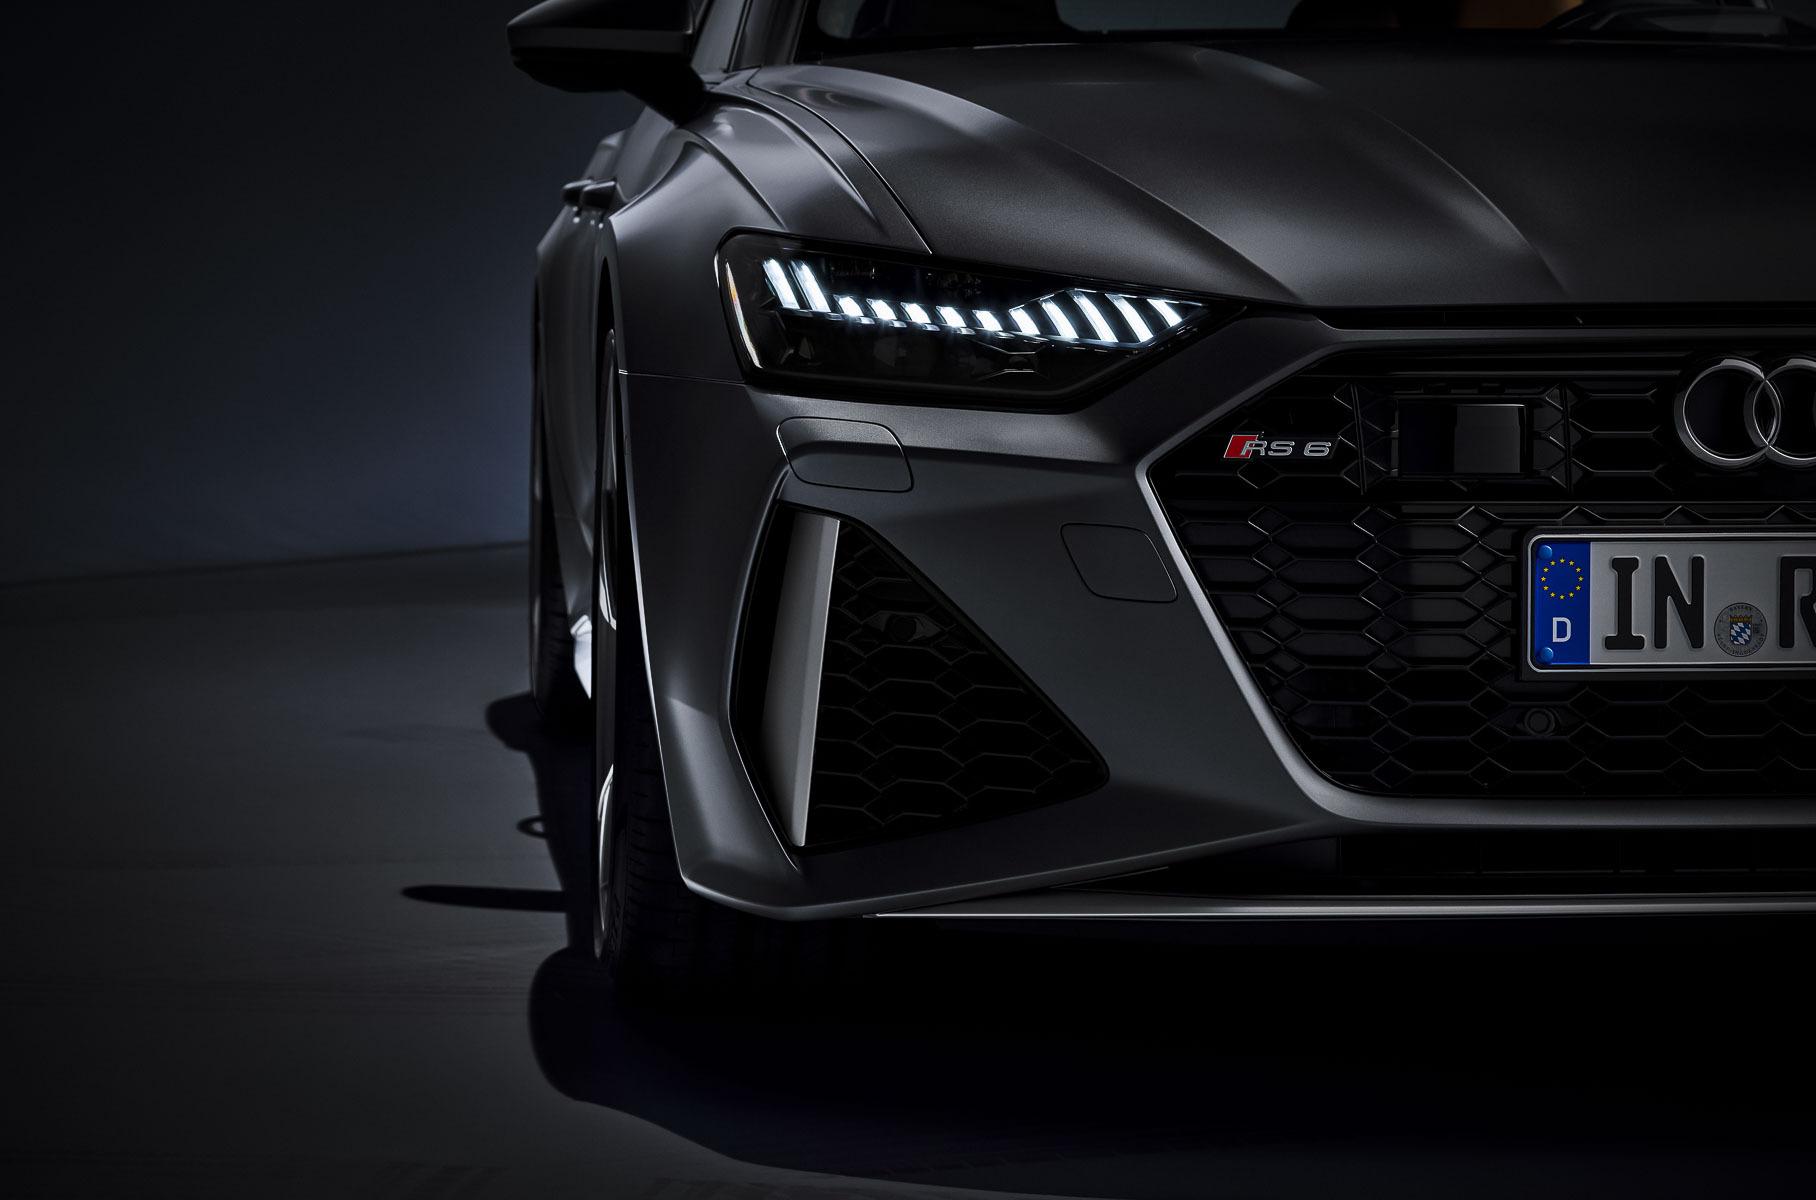 Audi назвала рублевые цены RS 6 Avant и RS 7 Sportback Новости